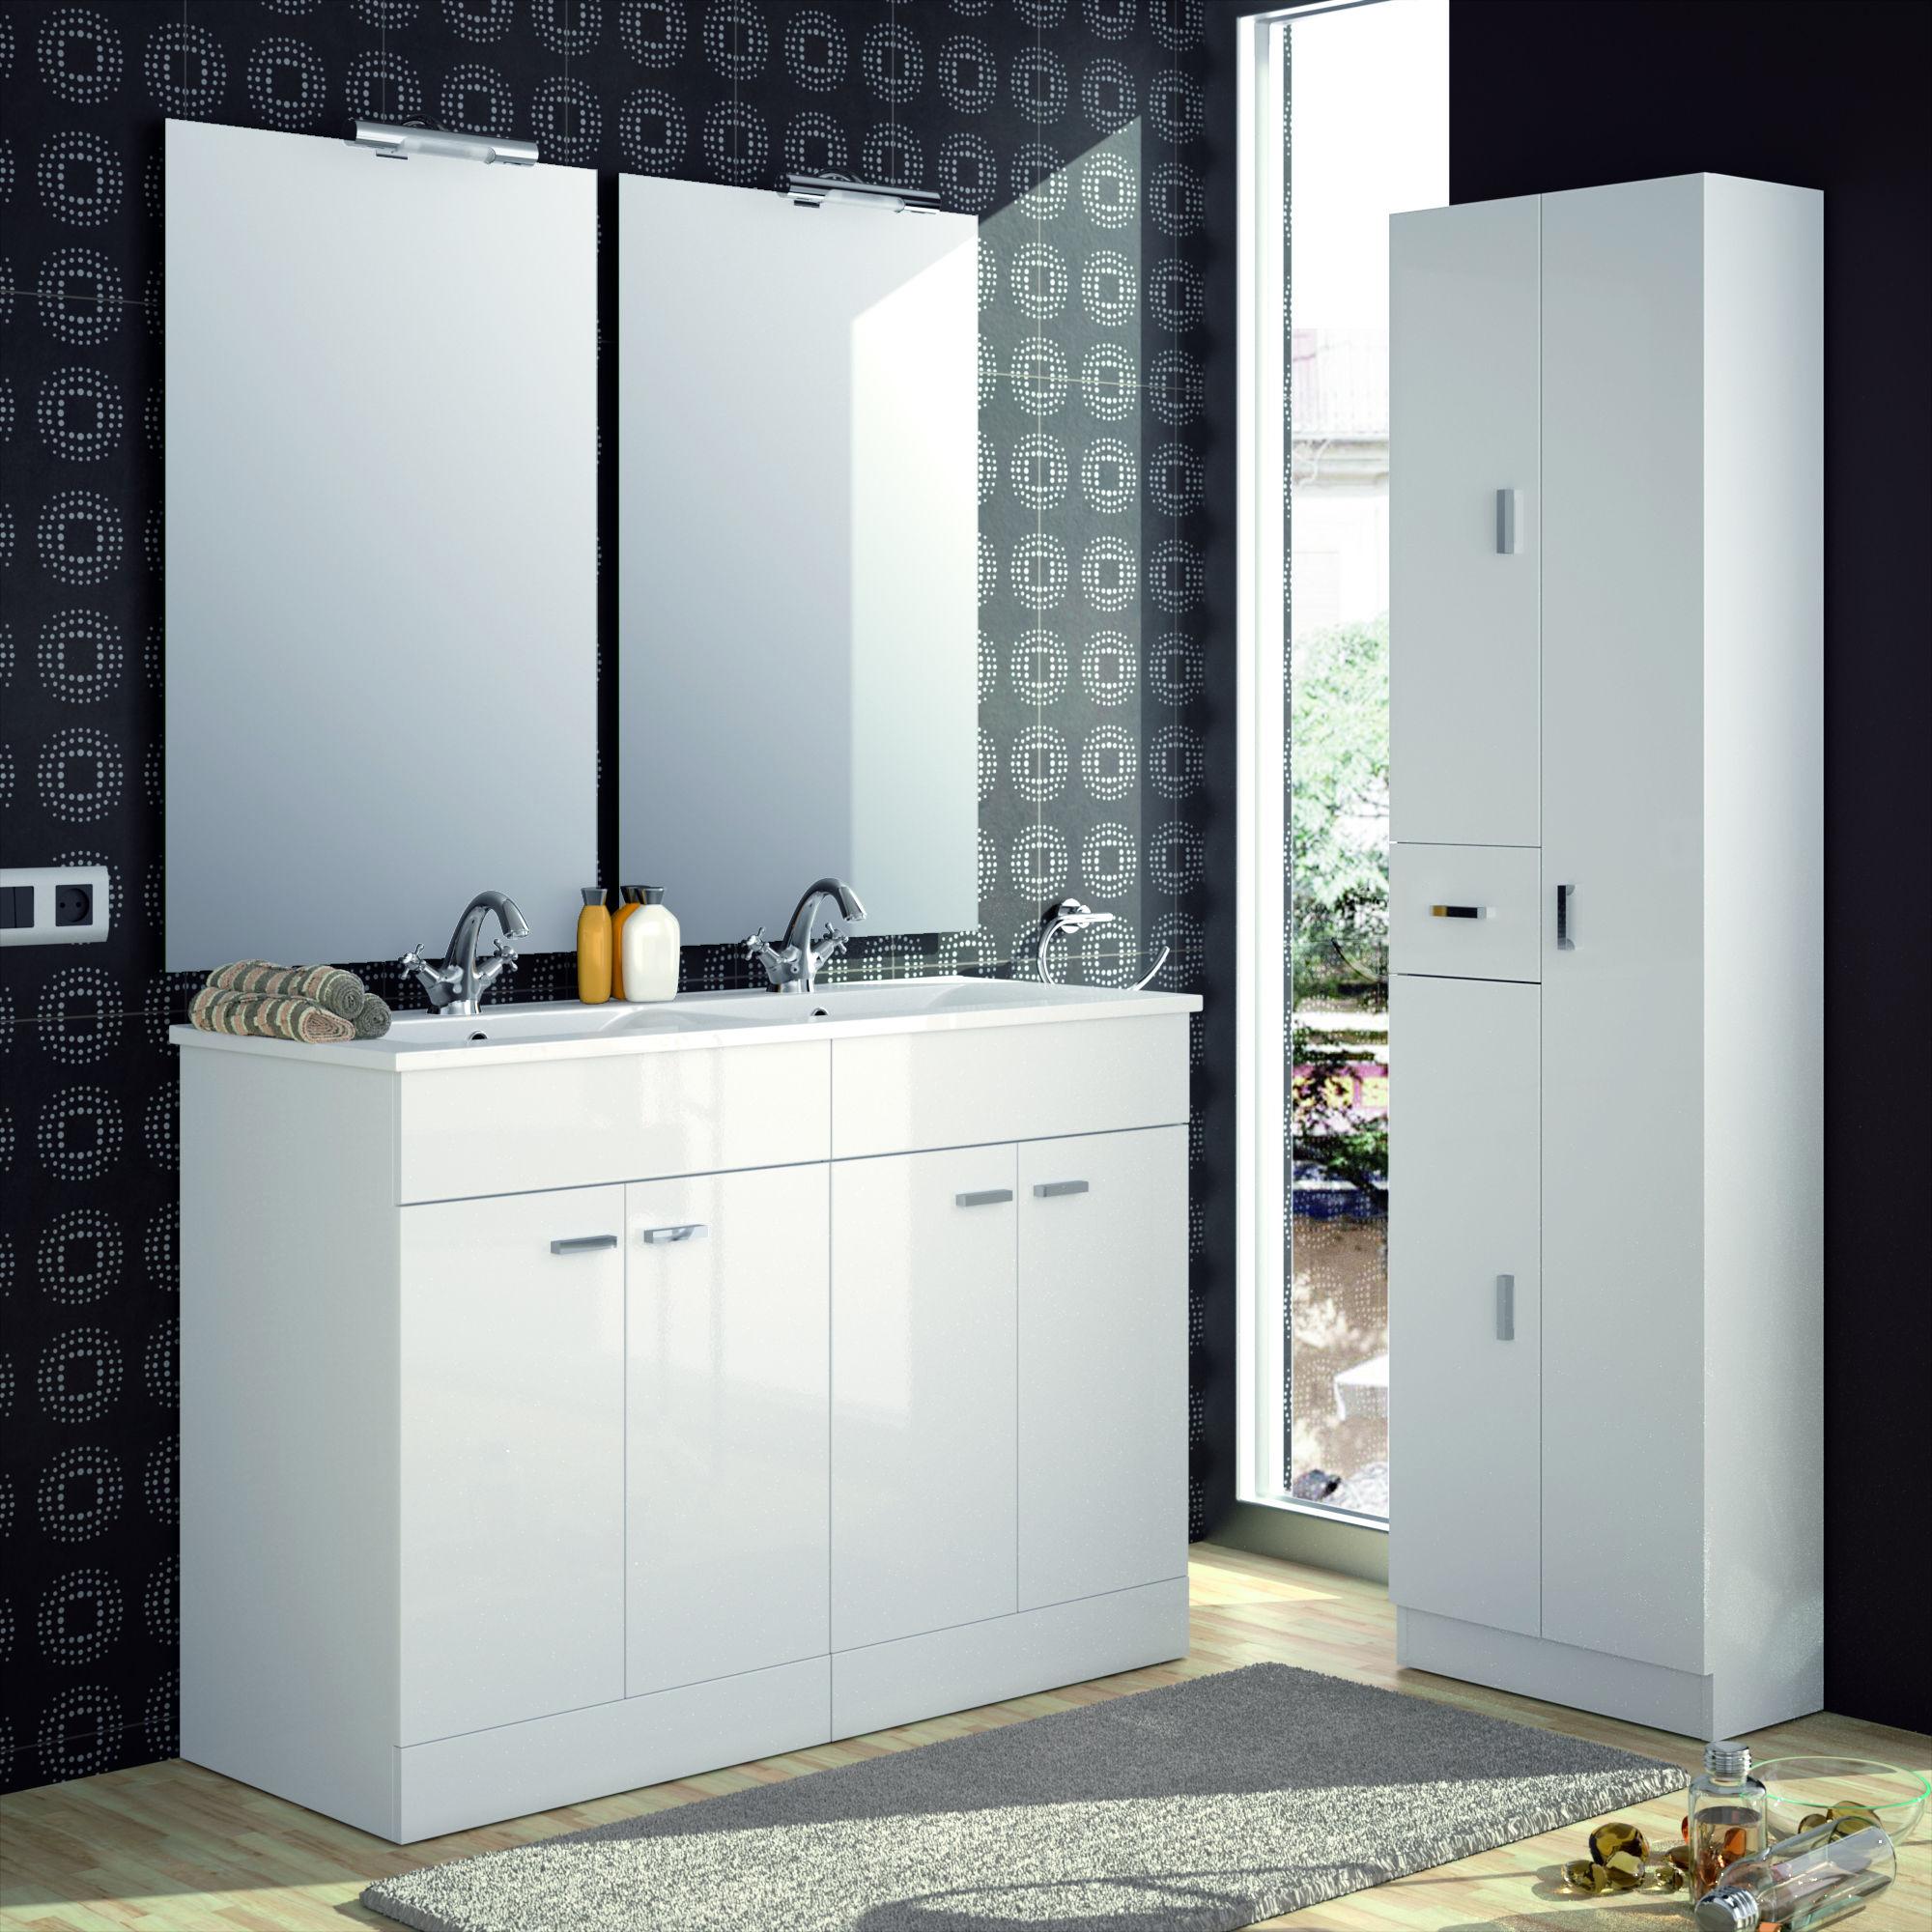 Hauteur lavabo salle de bain - Amazon meuble salle de bain ...